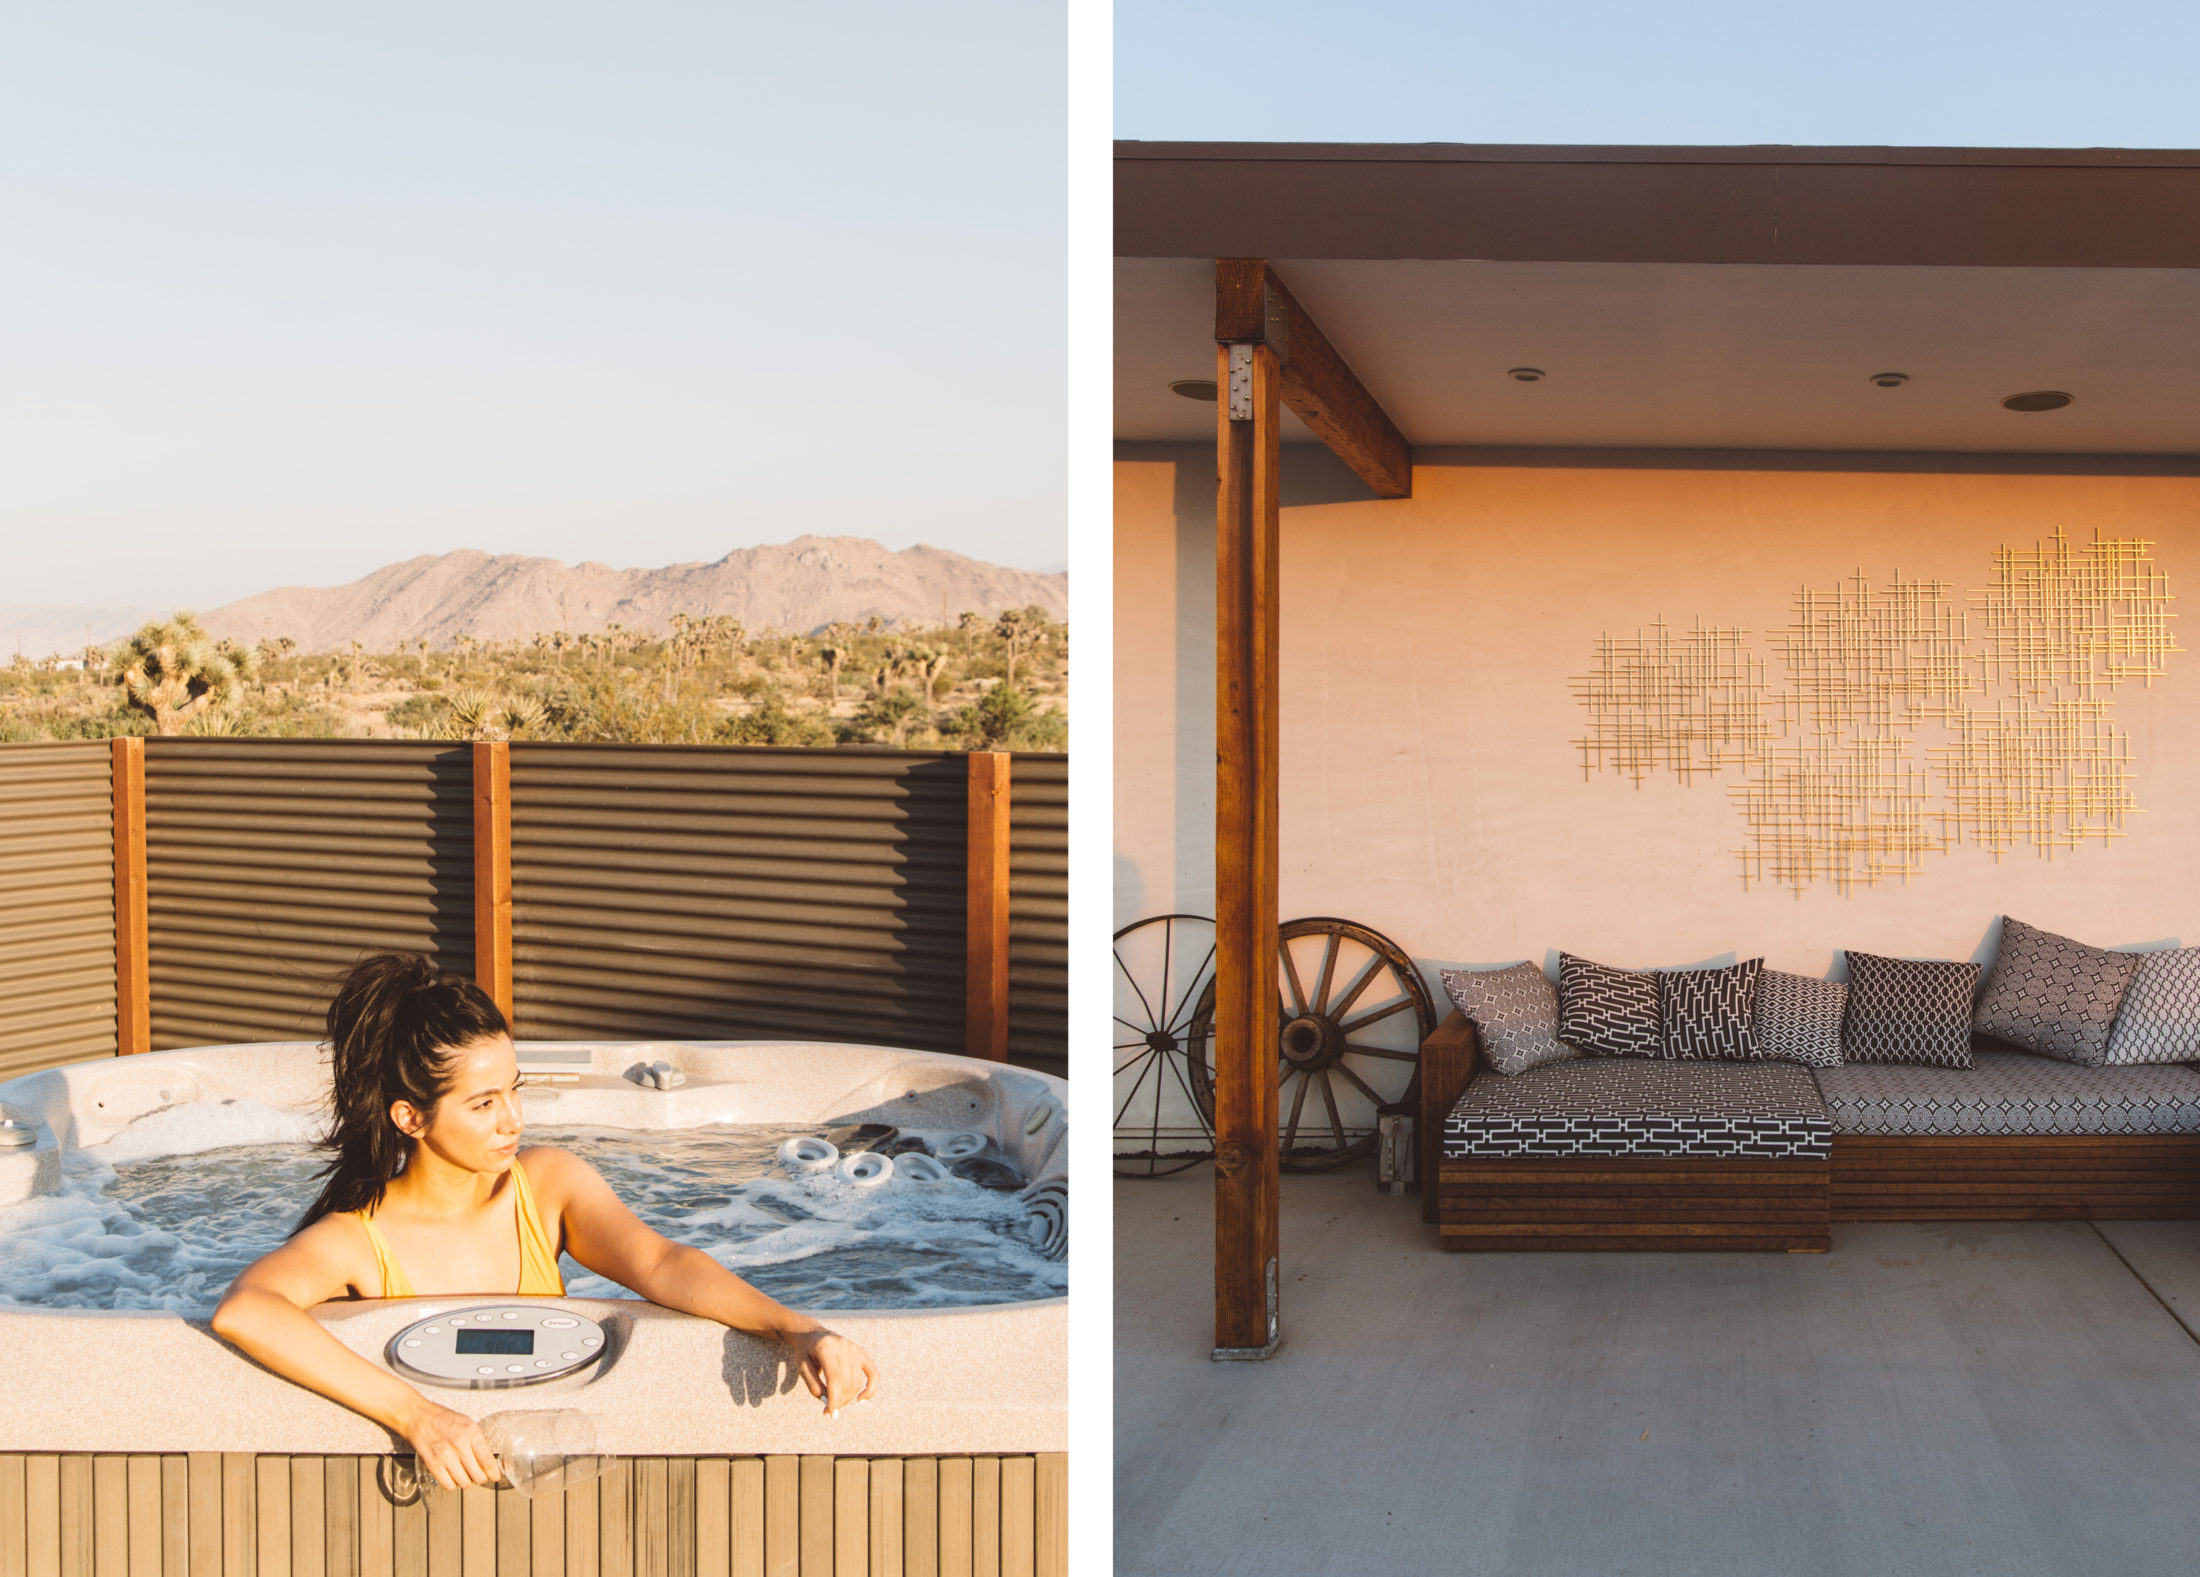 Serenity Escape: A Desert Oasis Near Joshua Tree